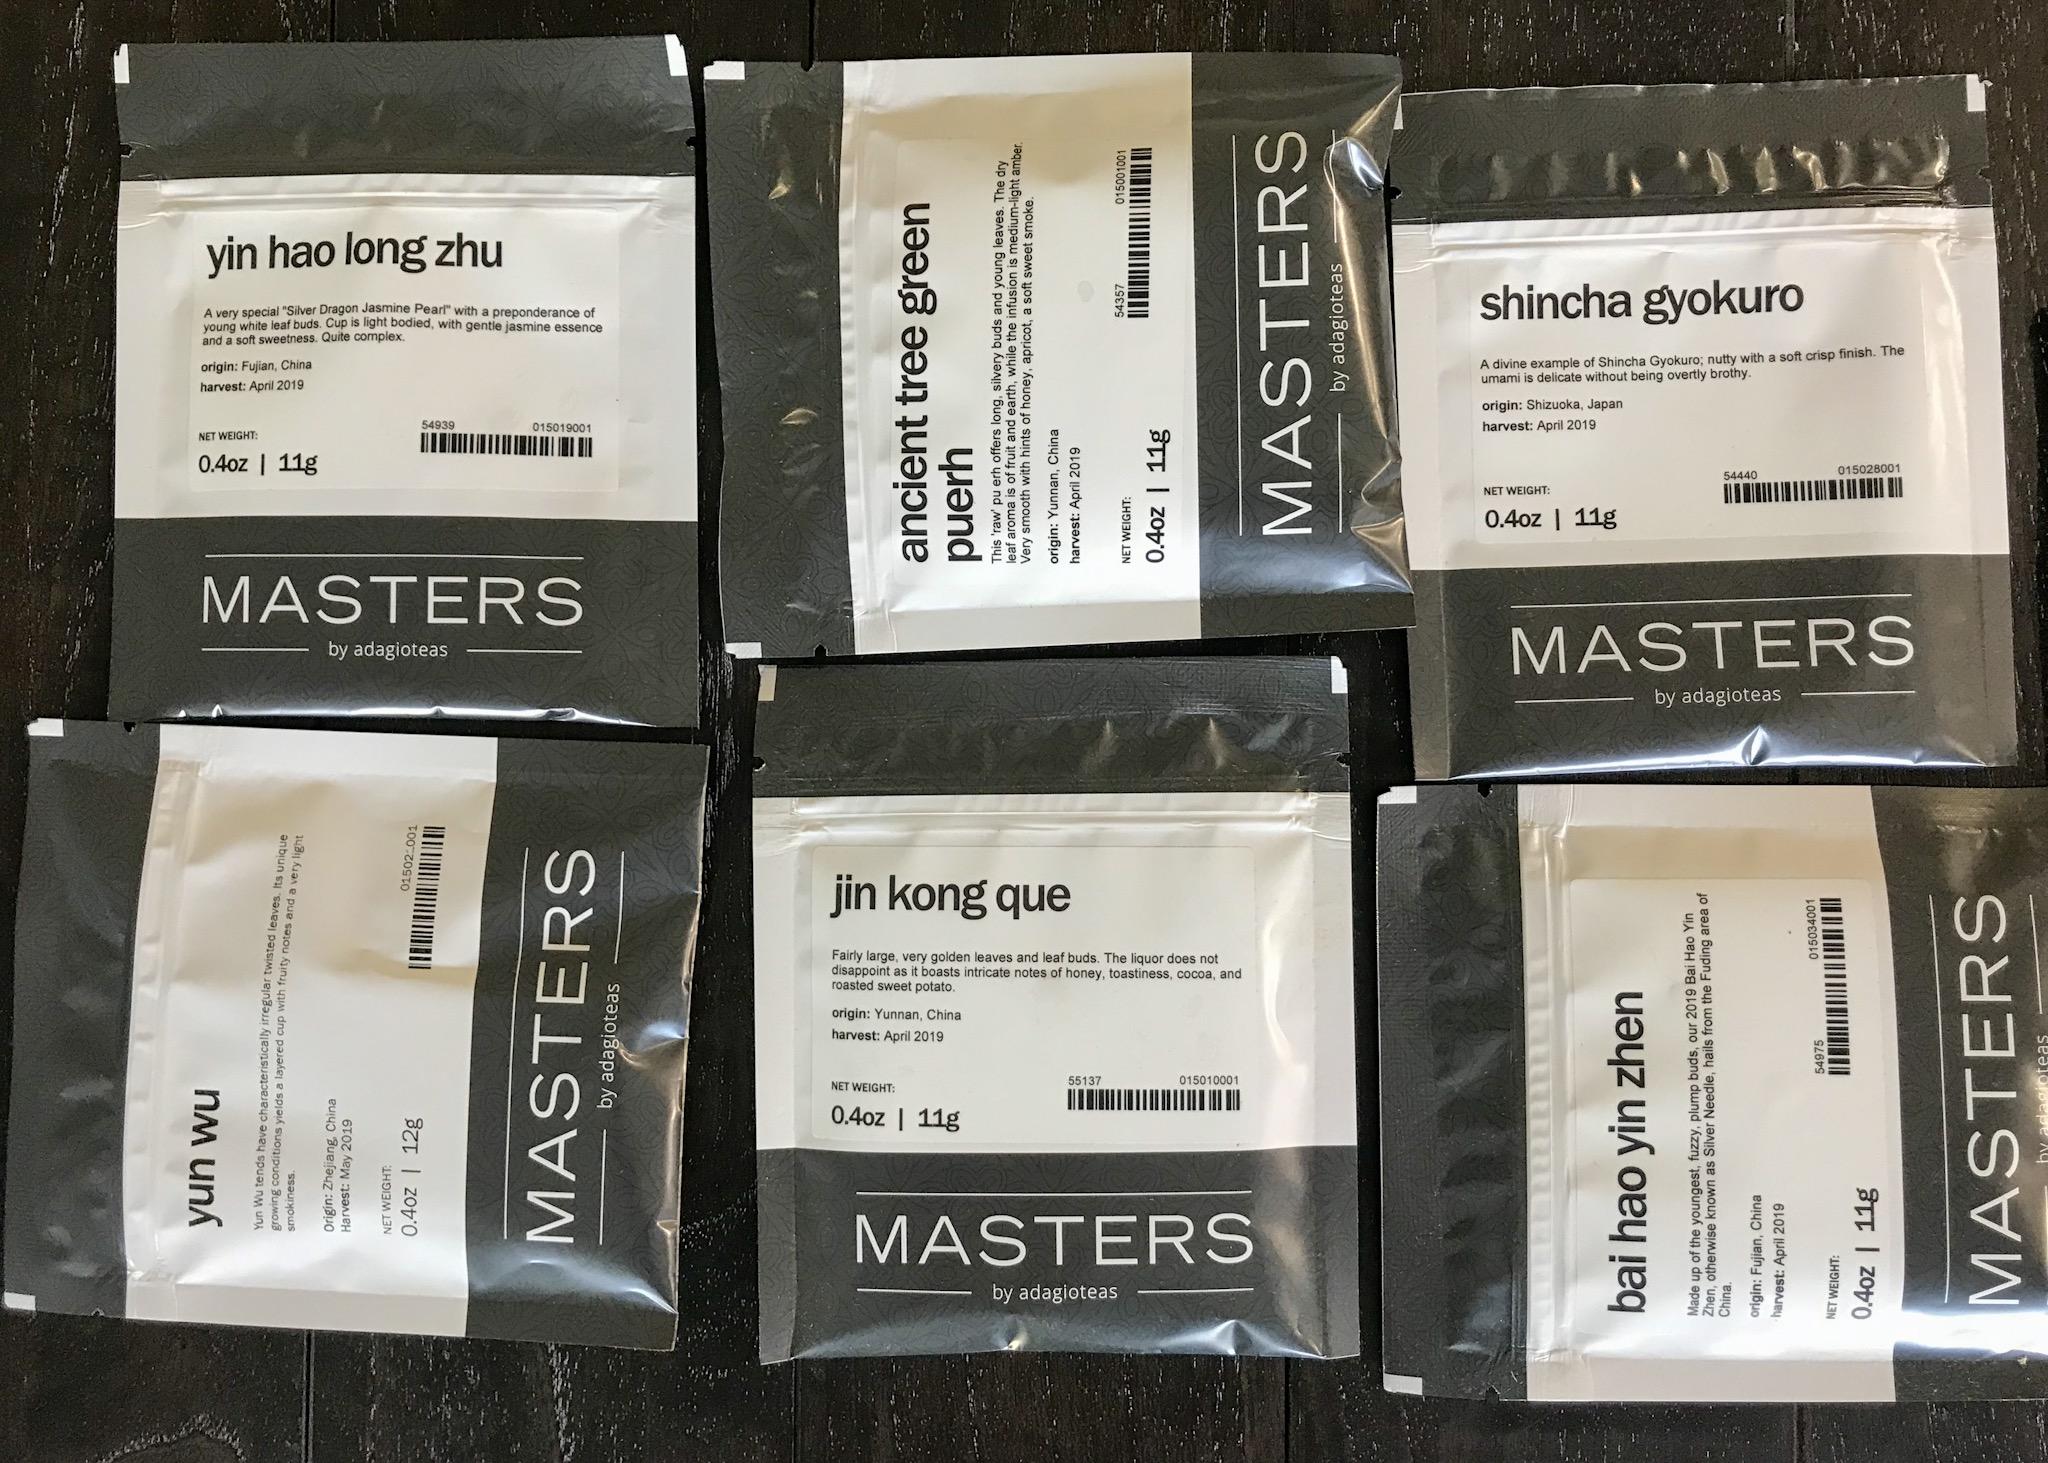 Adagio Masters Teas Review